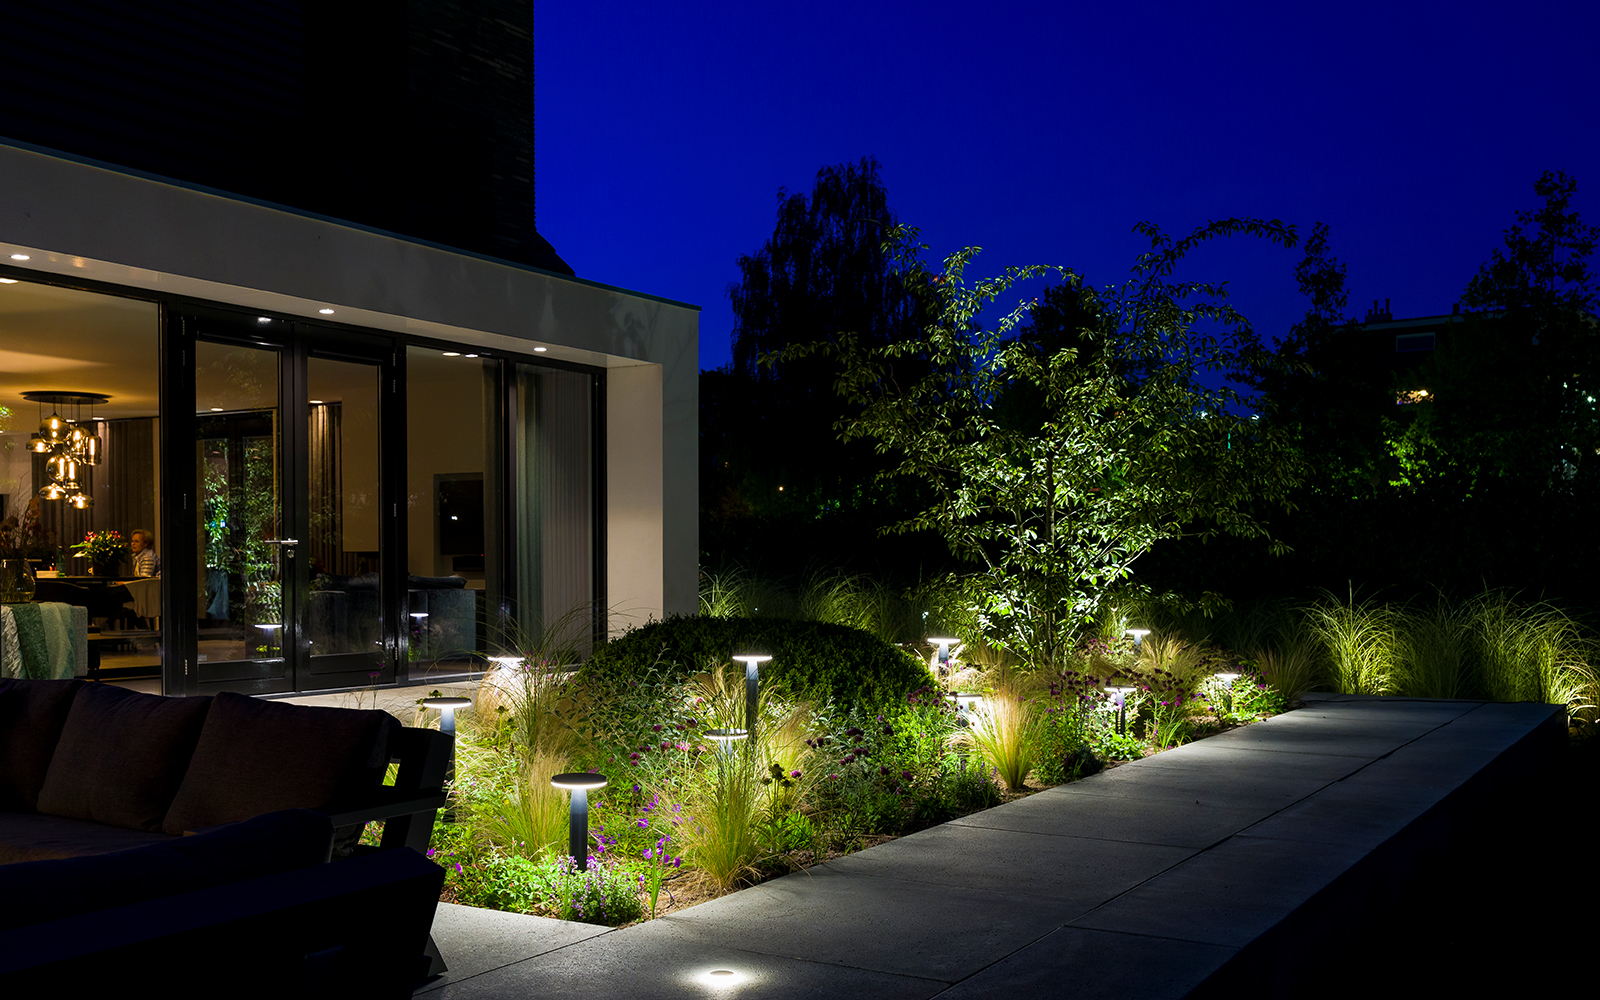 voortuin, in-lite, verlichting, tuinverlichting, the art of living